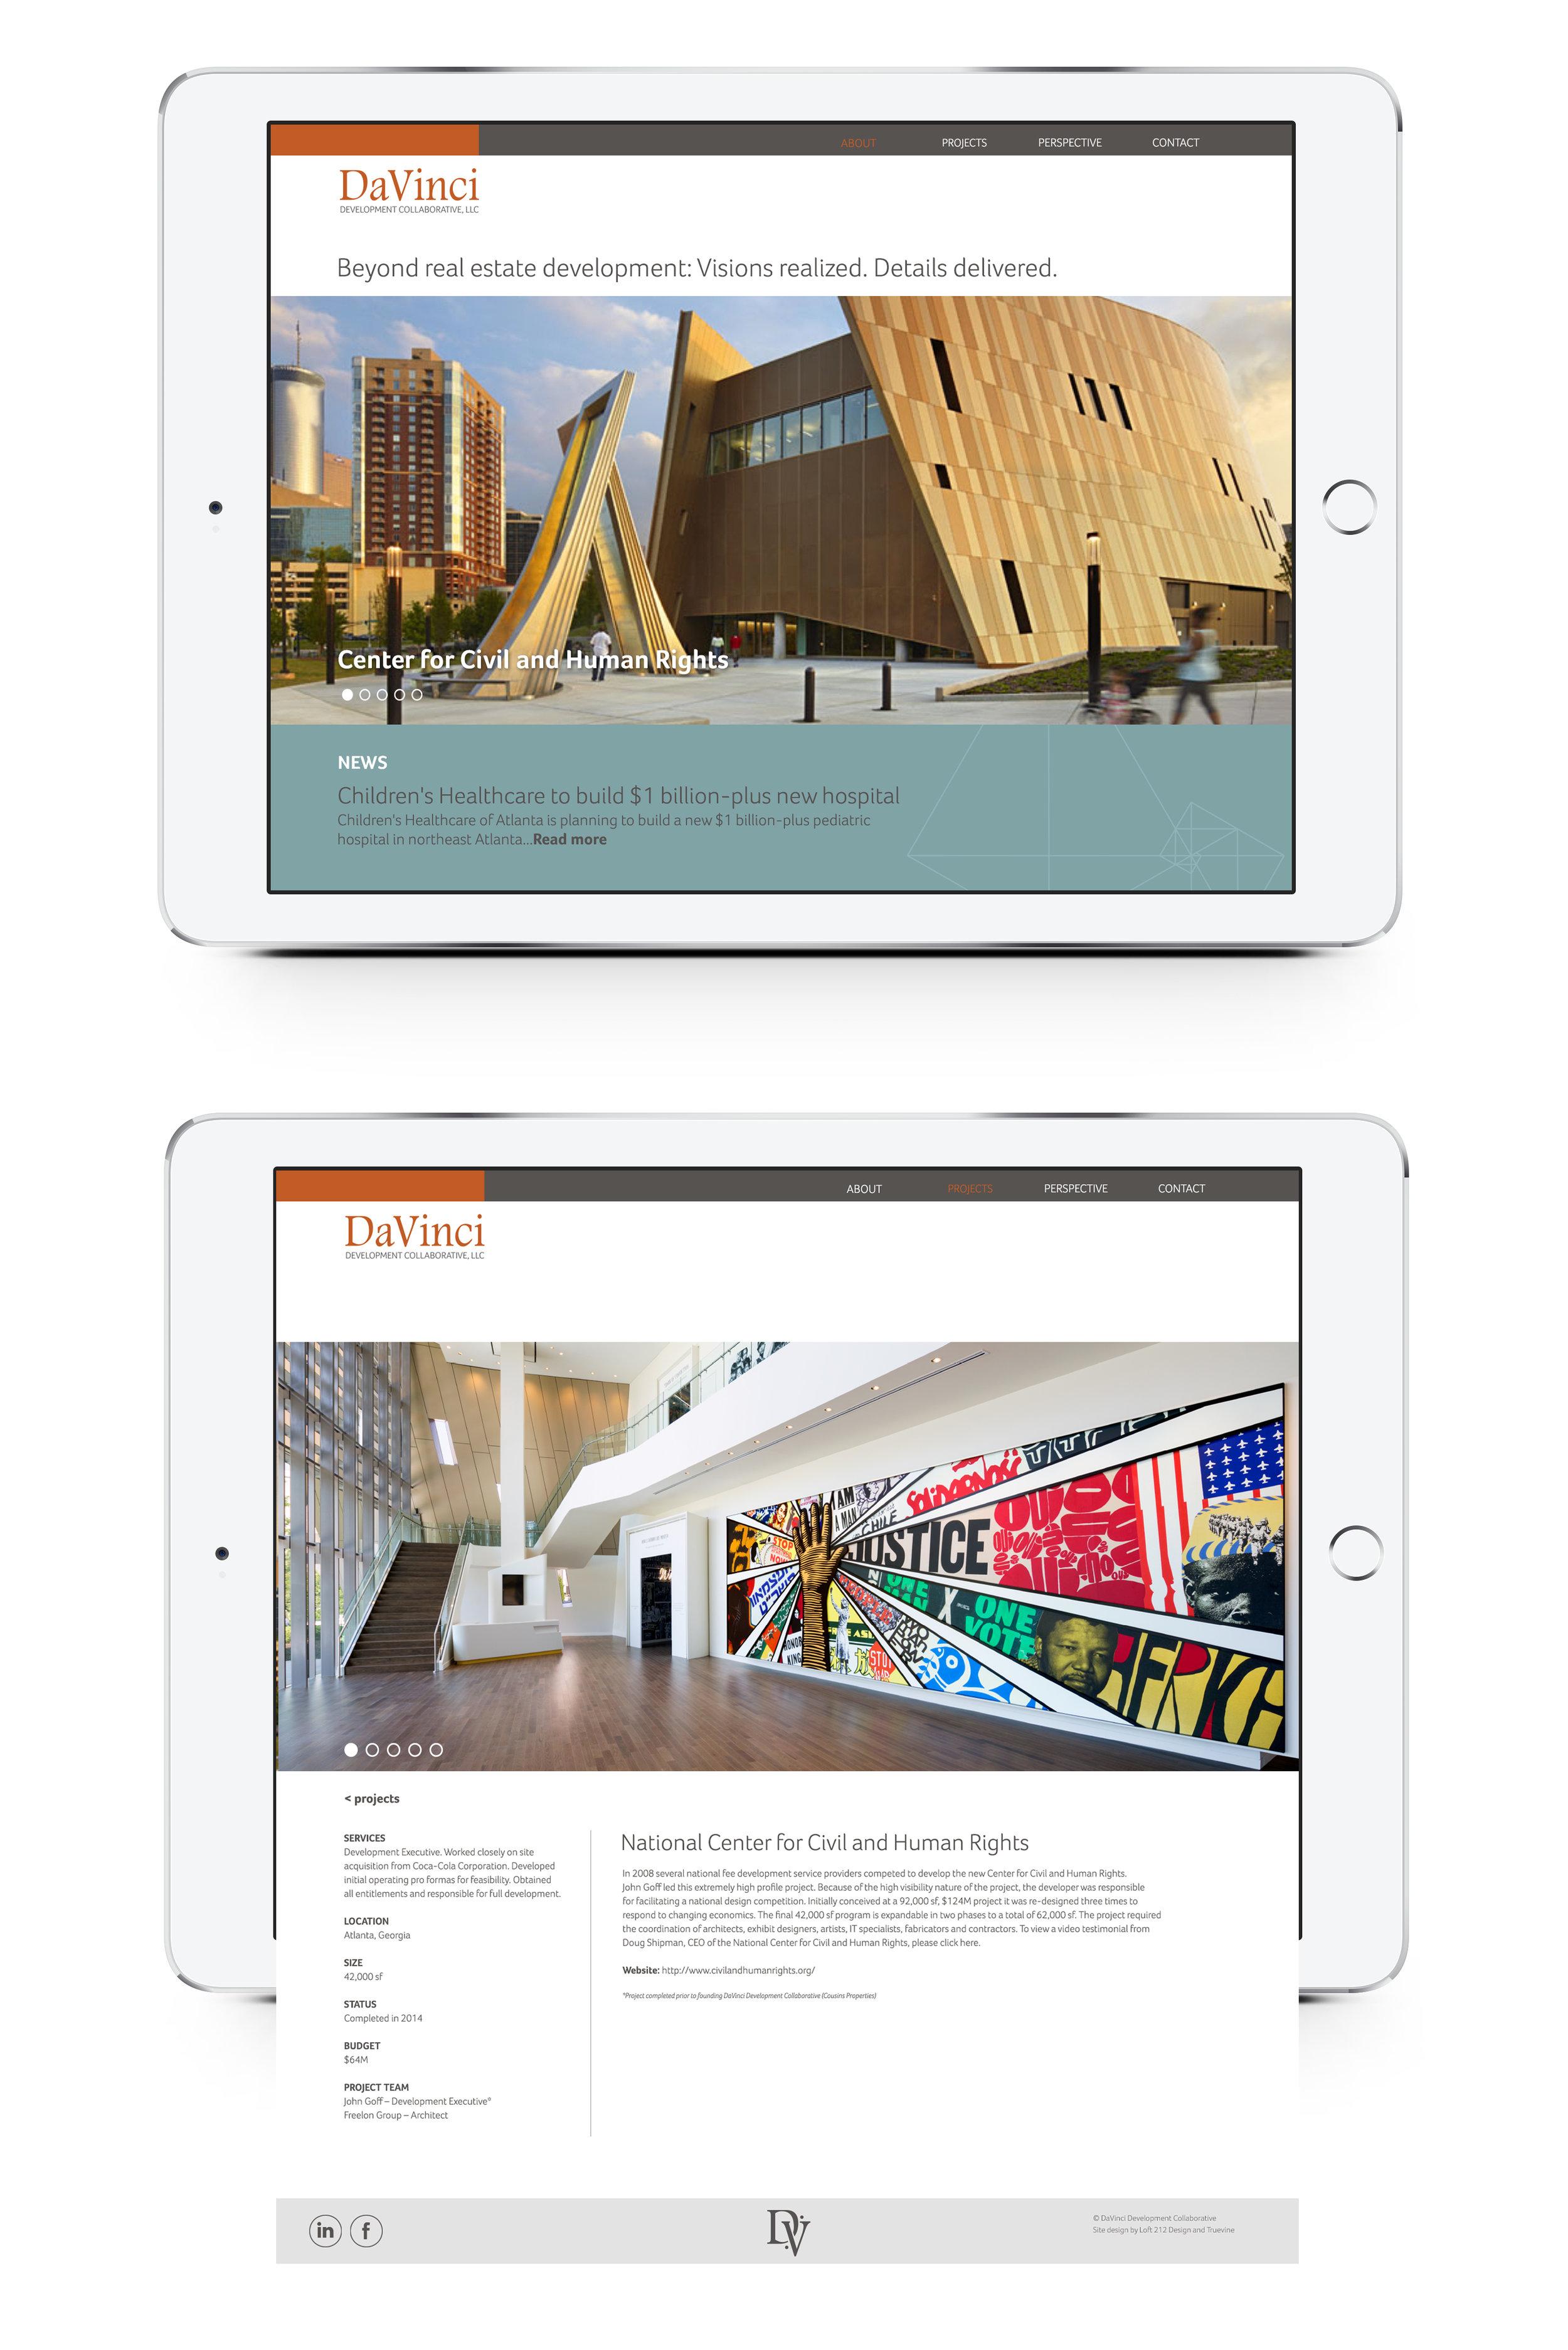 Davinci_Homepage.jpg